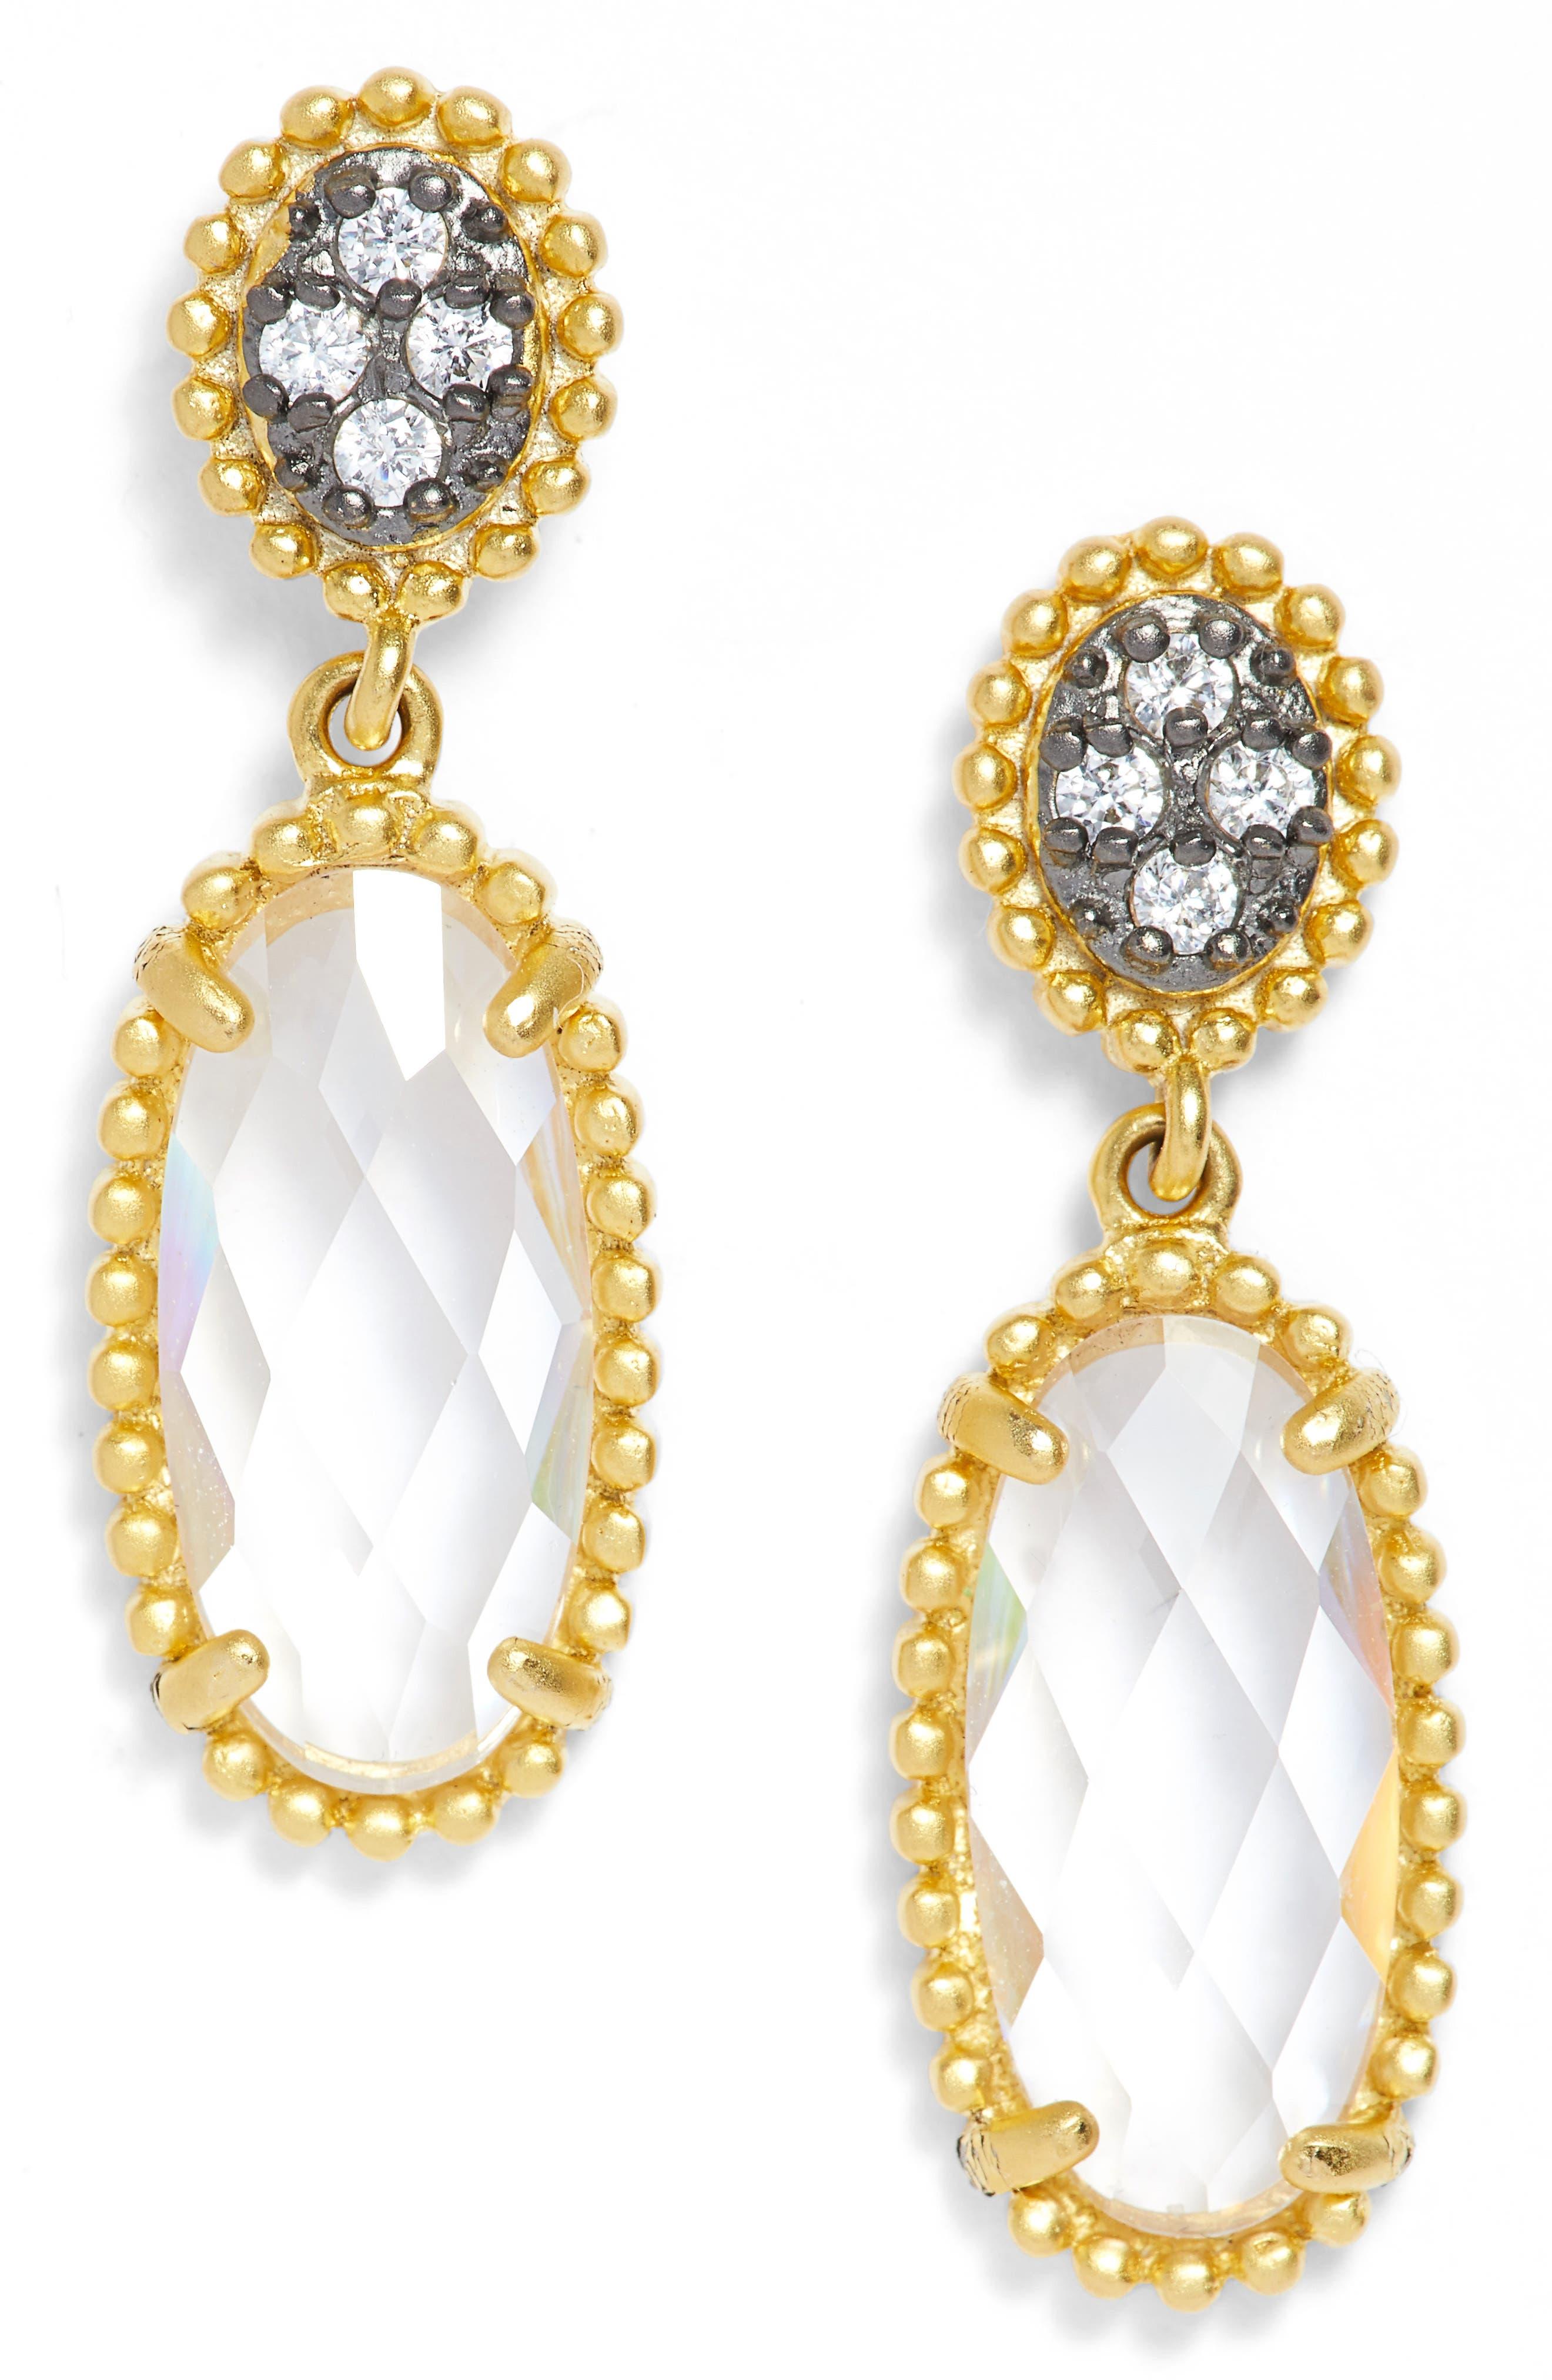 FRIEDA ROTHMAN Oval Drop Earrings,                         Main,                         color, Gold/ Black Rhodium